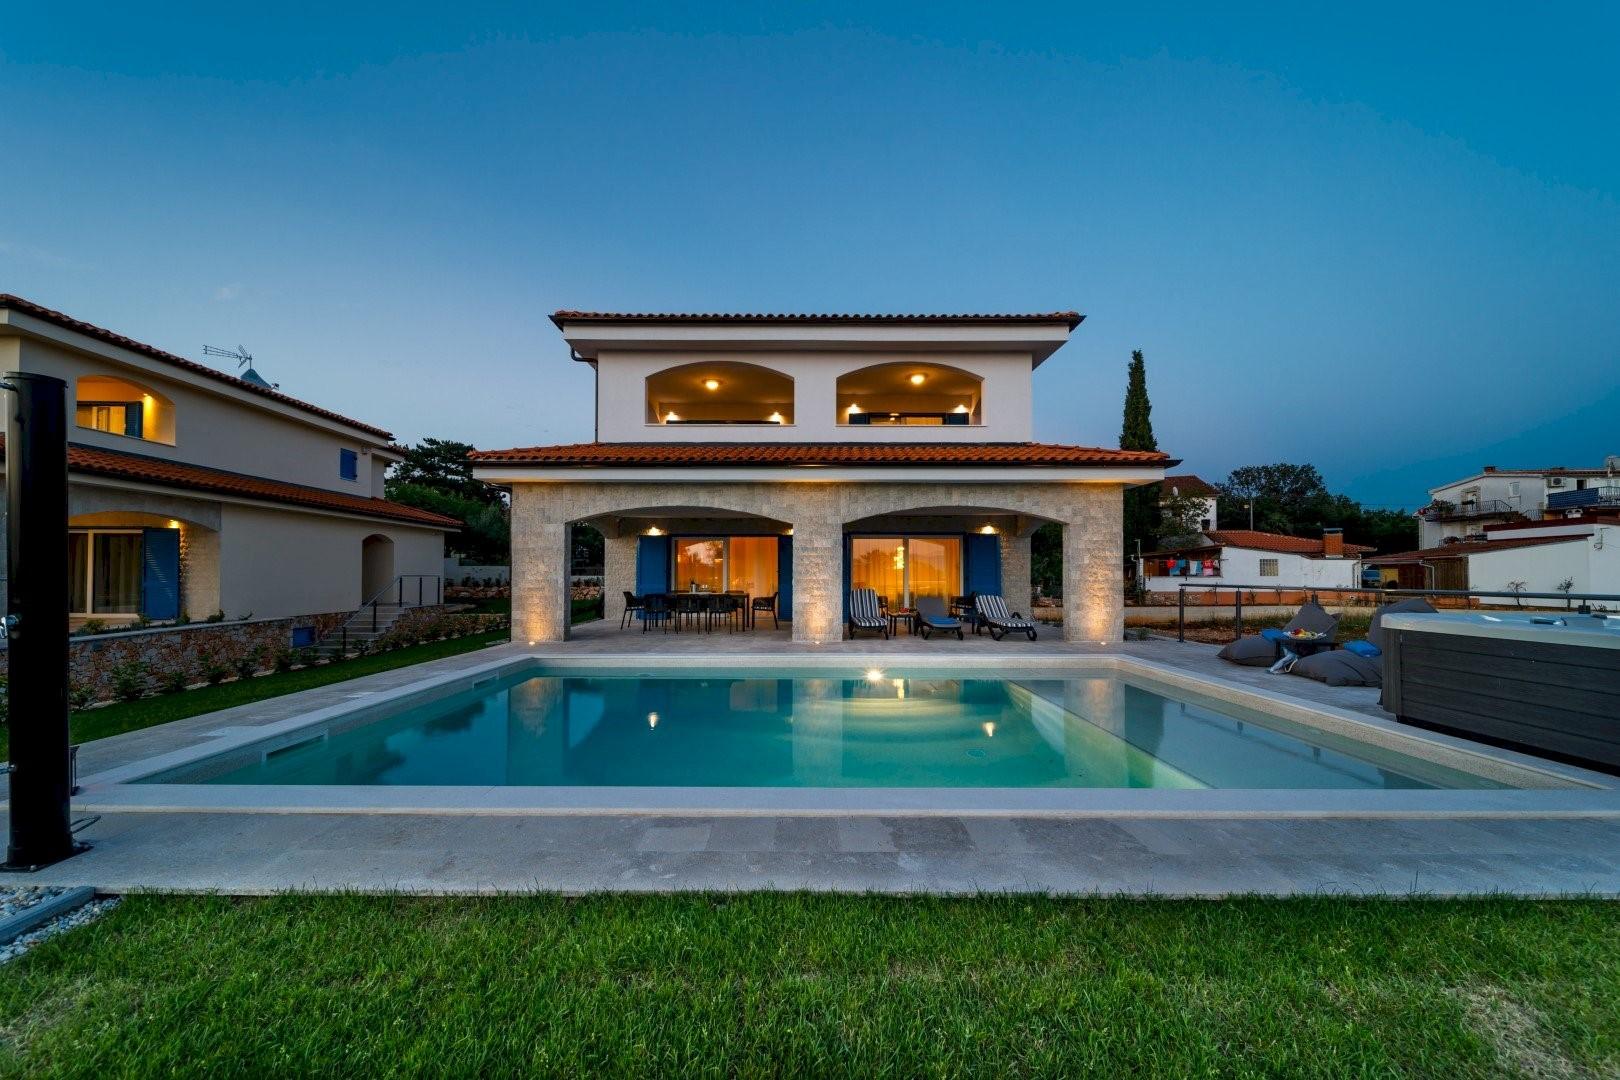 Ferienhaus Luxury Villa Loma 1 (2586644), Sveti Vid-Miholjice, Insel Krk, Kvarner, Kroatien, Bild 23